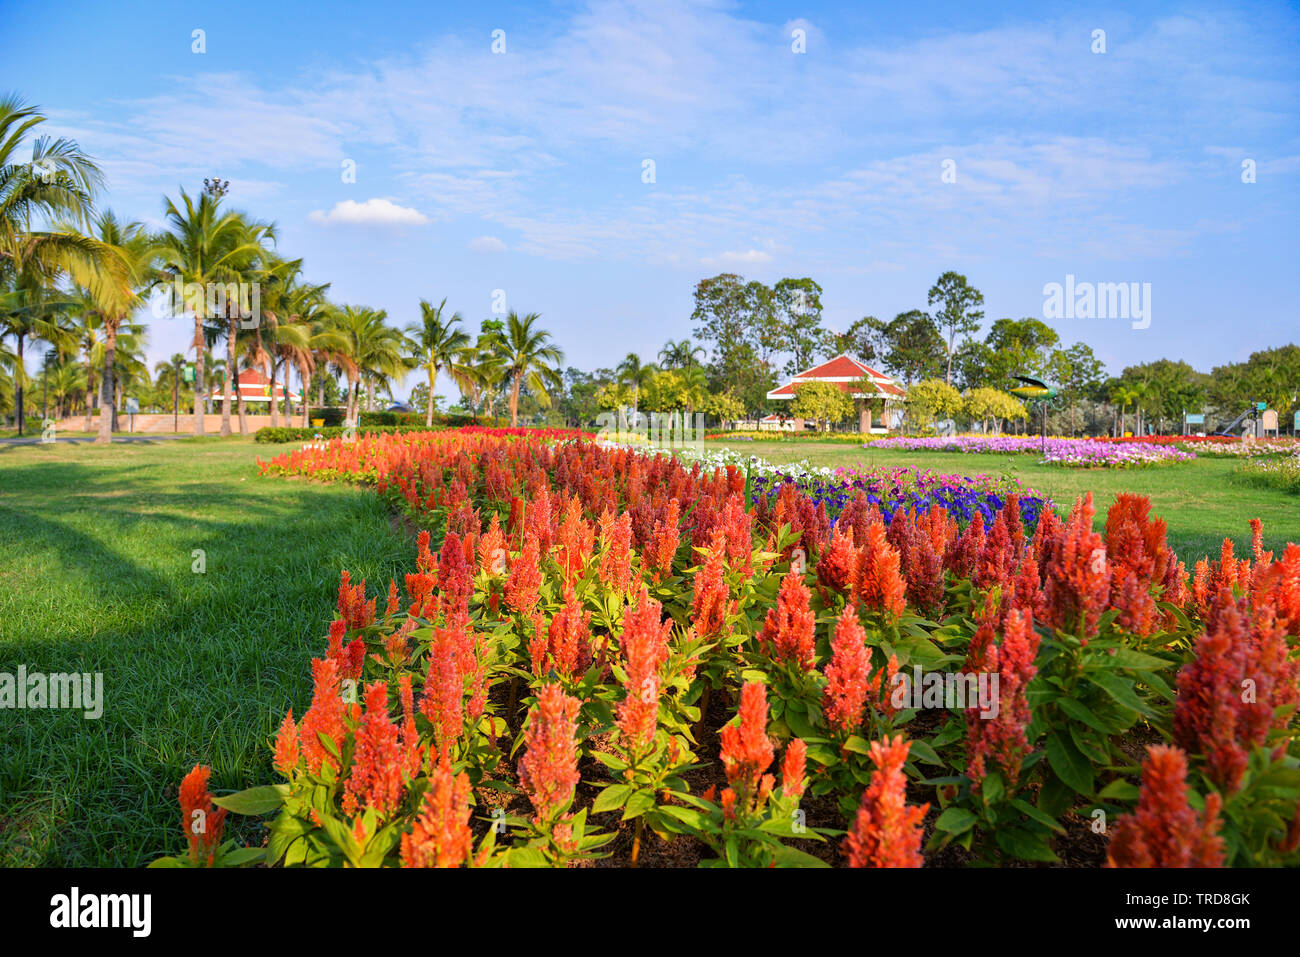 Orange plumed cockscomb or Celosia argentea blossom in the colorful garden spring flower park Stock Photo